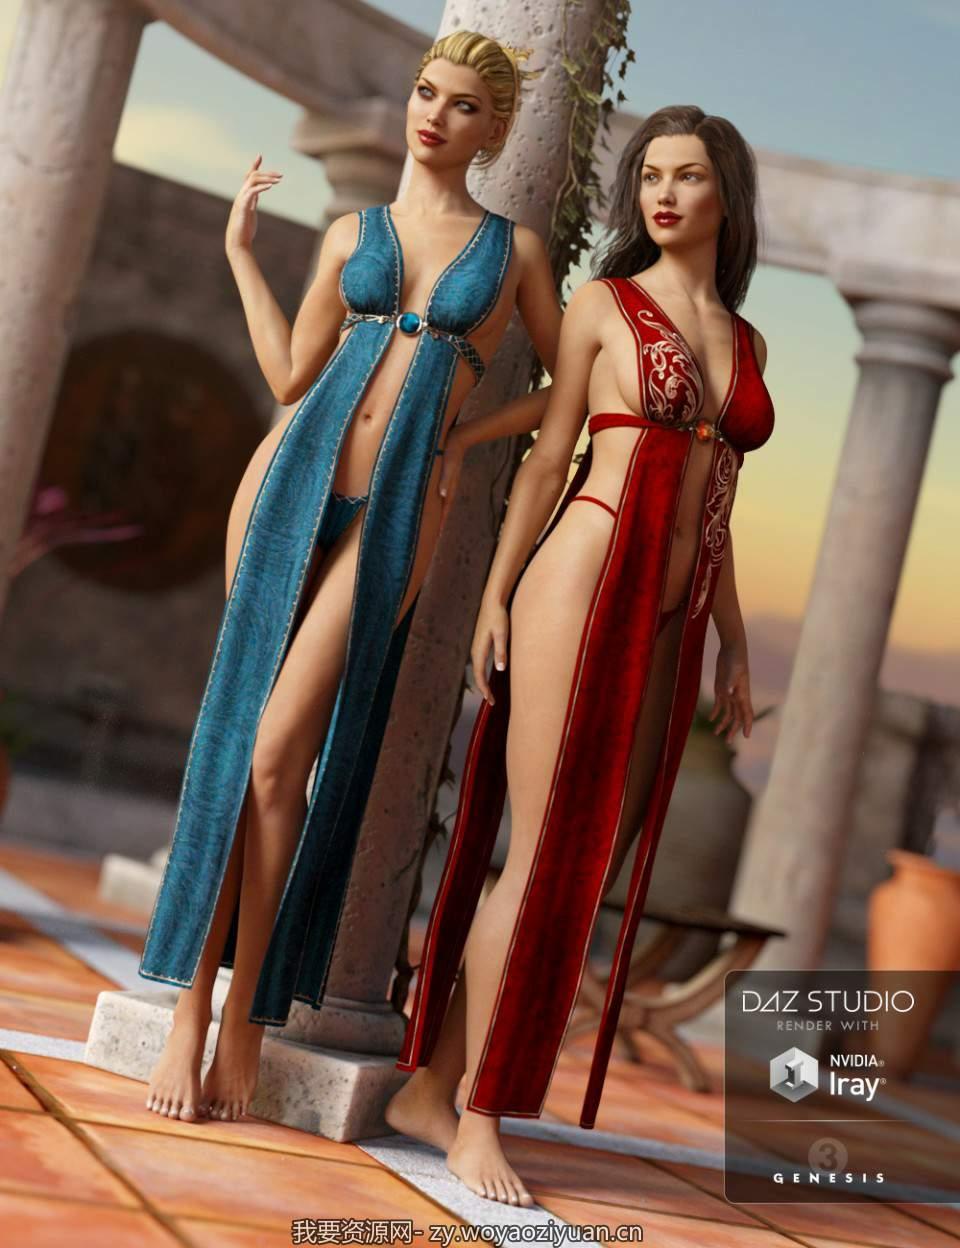 Fantasy Wrap for Genesis 3 Female(s) Textures